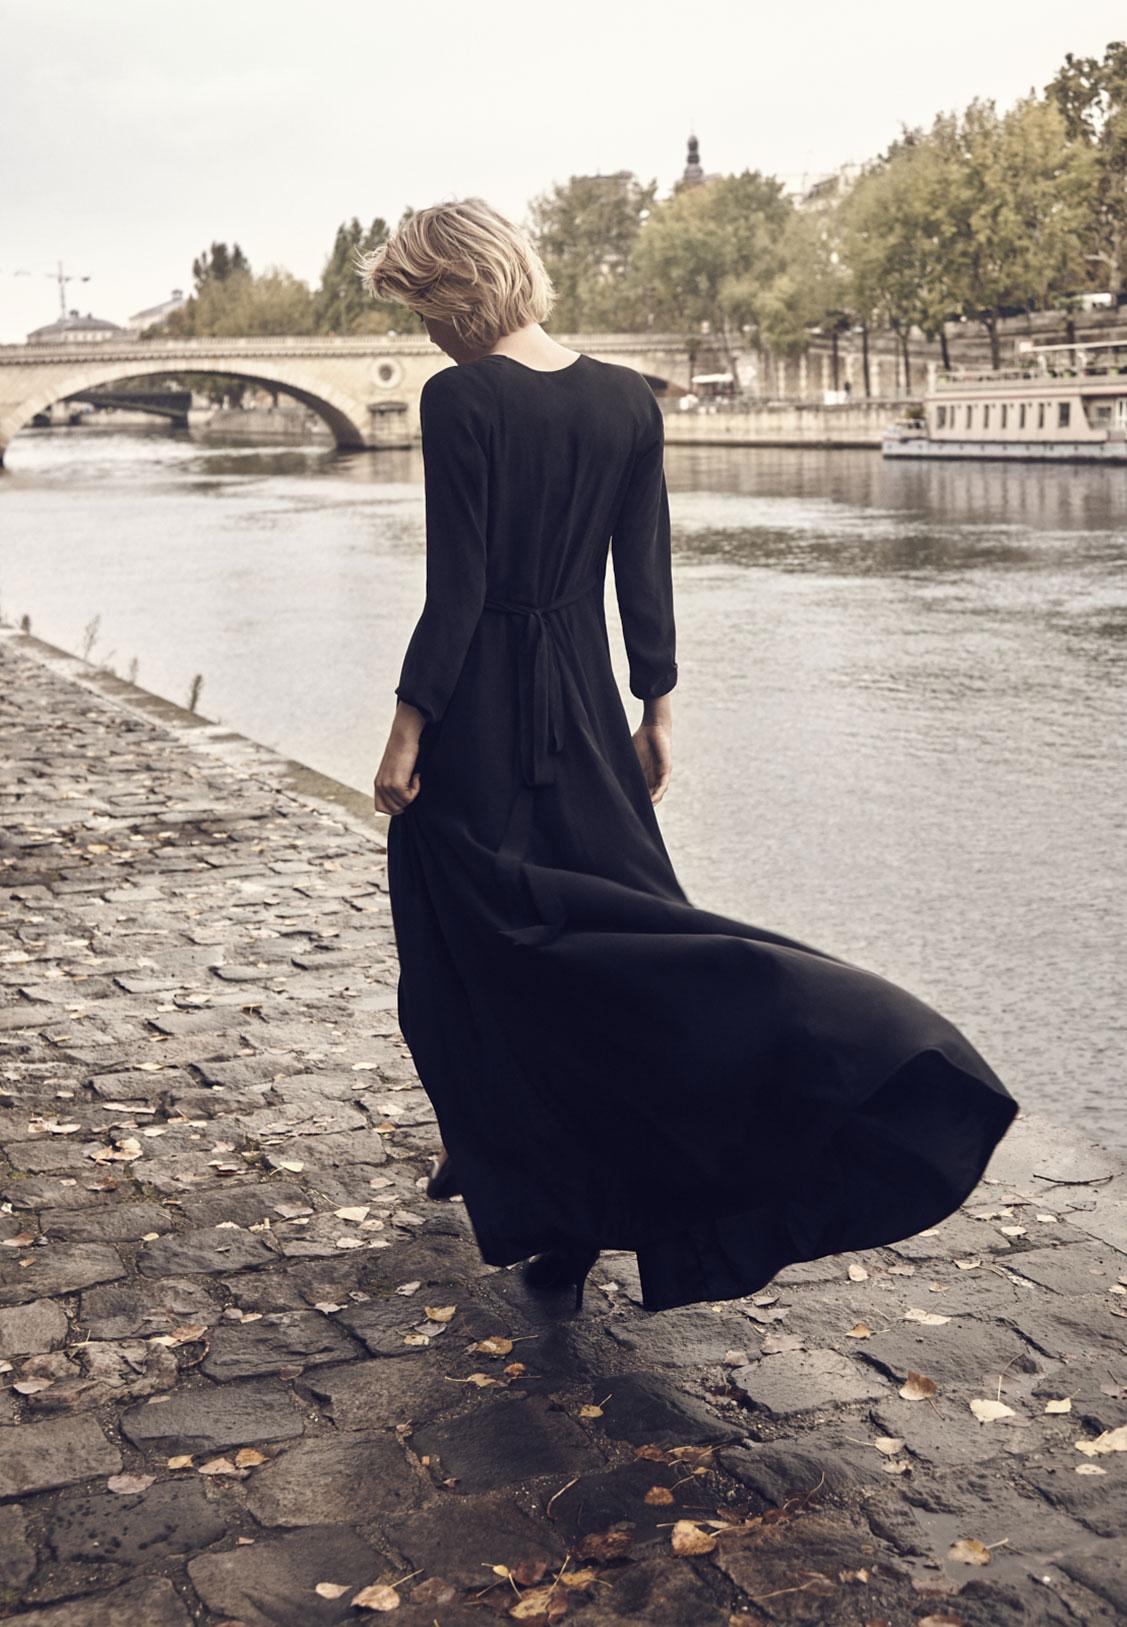 Прогулка по Парижу с фотомоделью Кэти Кук / Katie Cook by Becky Siegel